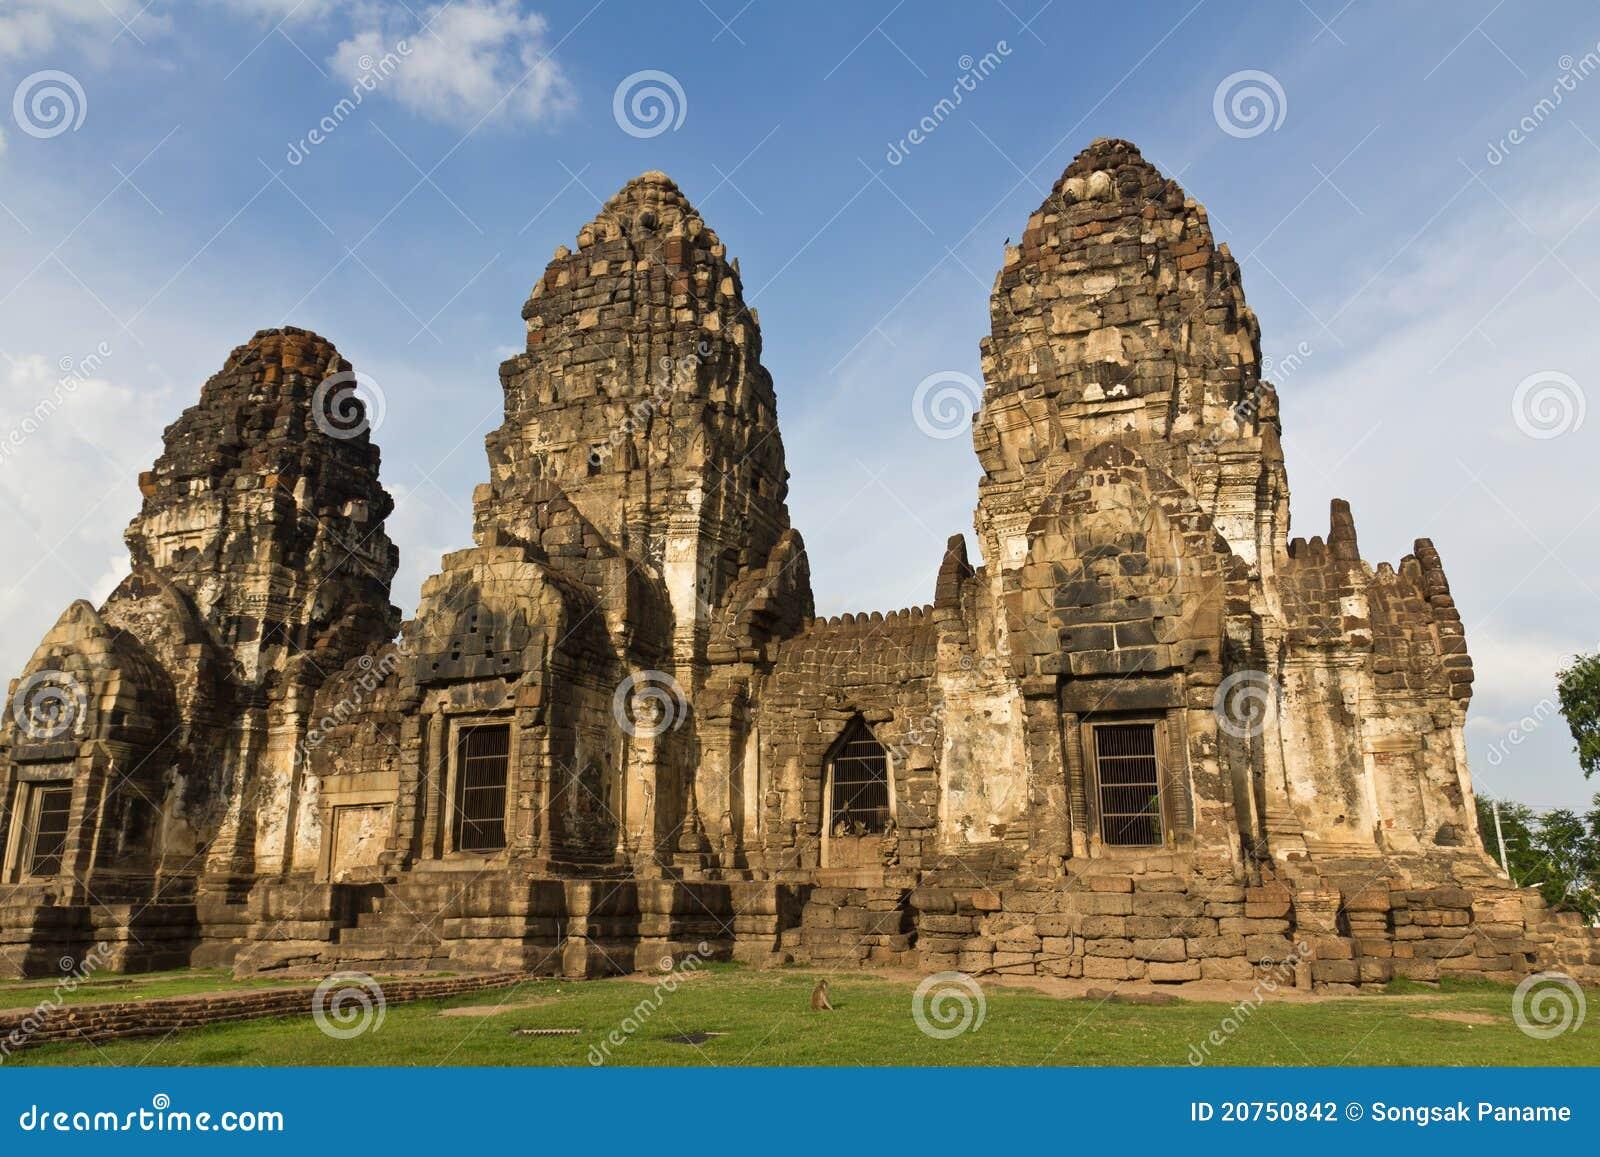 Wat Phra Prang Sam Yot Stock Photography - Image: 20750842